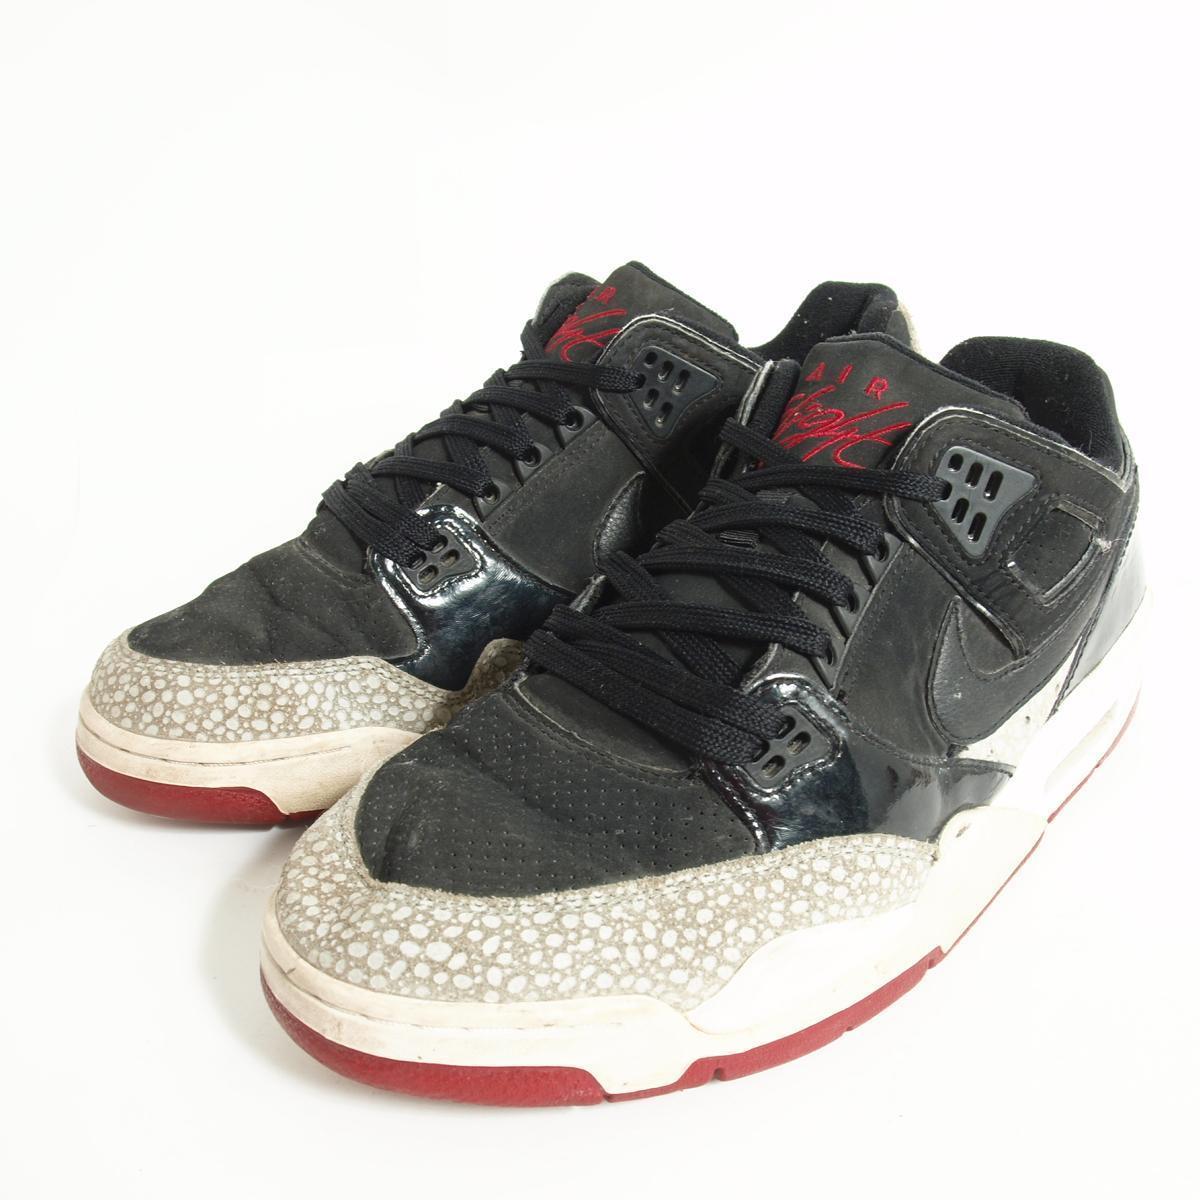 2e55e1c565c3dc VINTAGE CLOTHING JAM  Nike AIR FLIGHT CONDOR sneakers US9 .5 men s ...